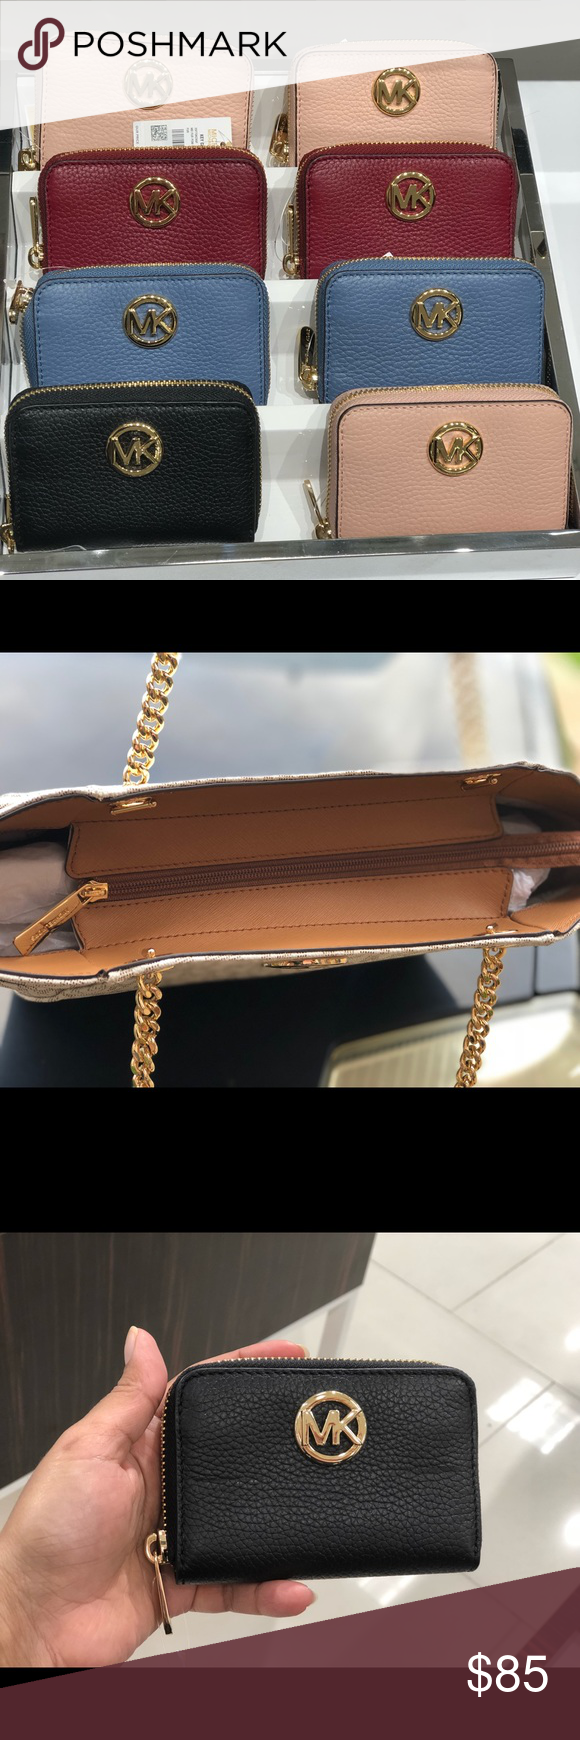 4e2fc6181c2e1a Michael Kors FULTON Leather Zip Around Coin Purse NWT Michael Kors FULTON  Leather Zip Around Coin